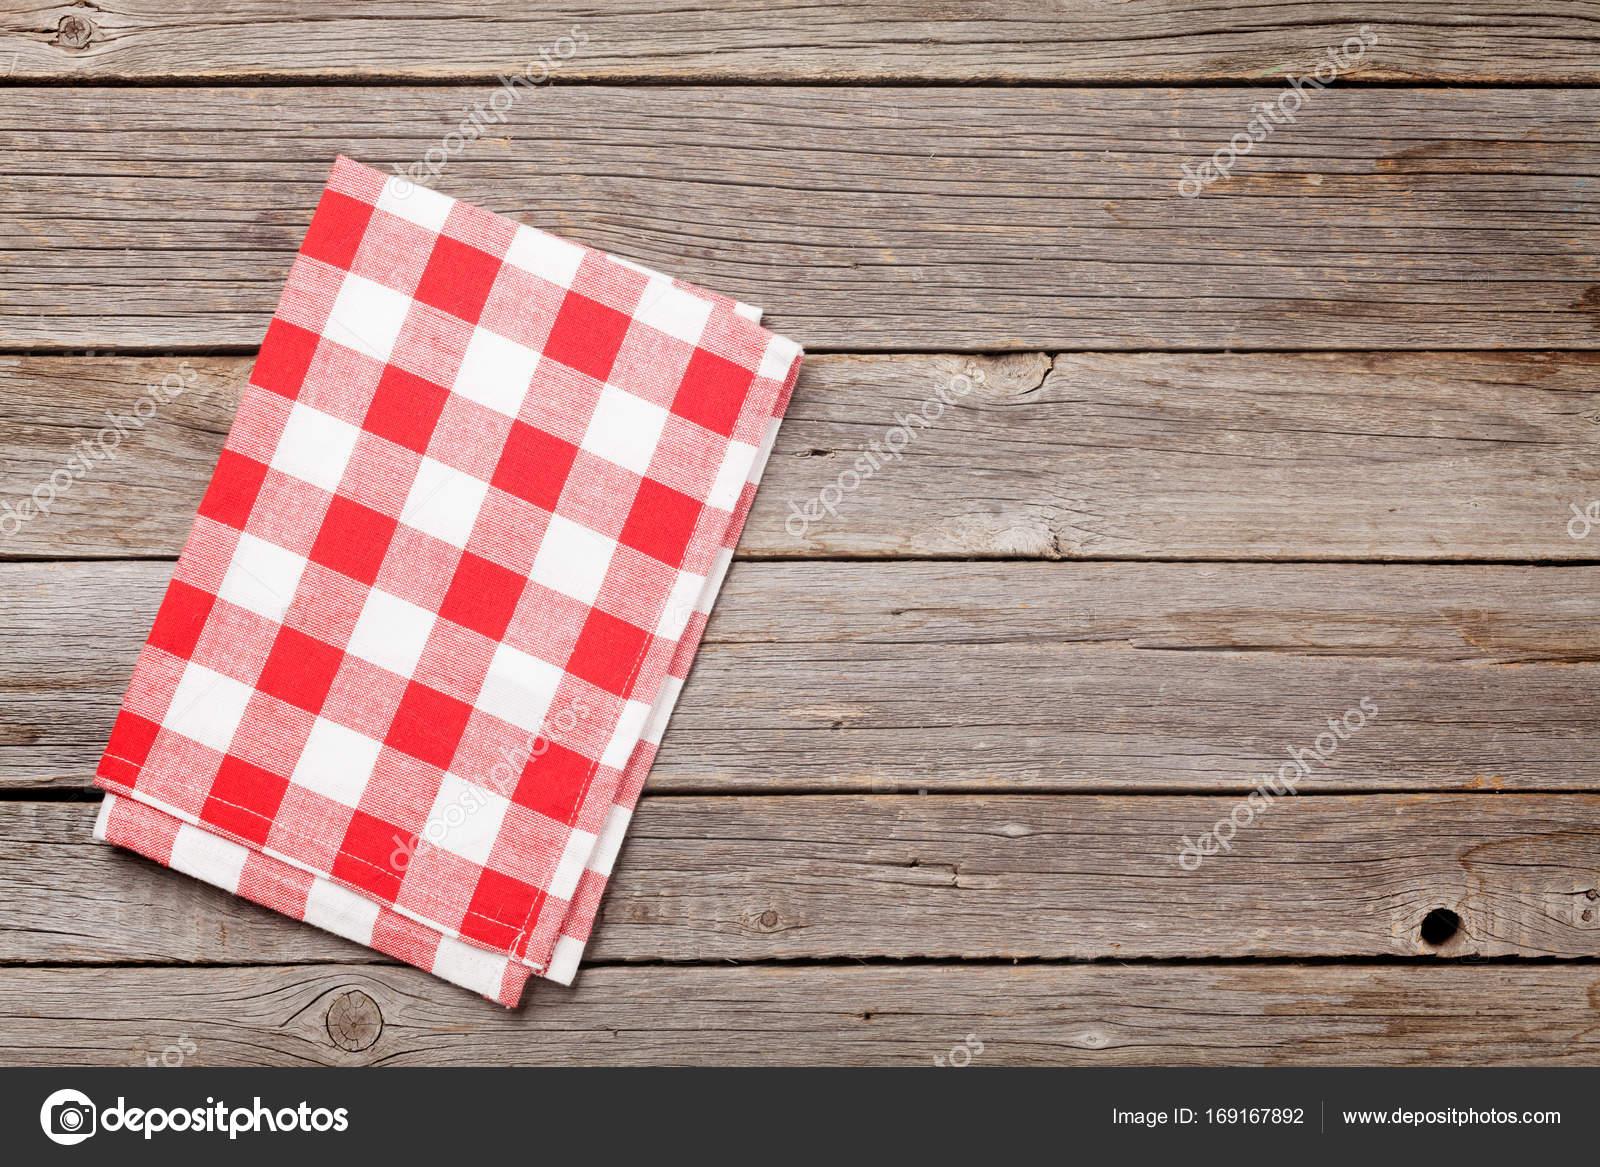 kitchen towel cost of custom cabinets 木制的桌子上厨房巾 图库照片 c karandaev 169167892